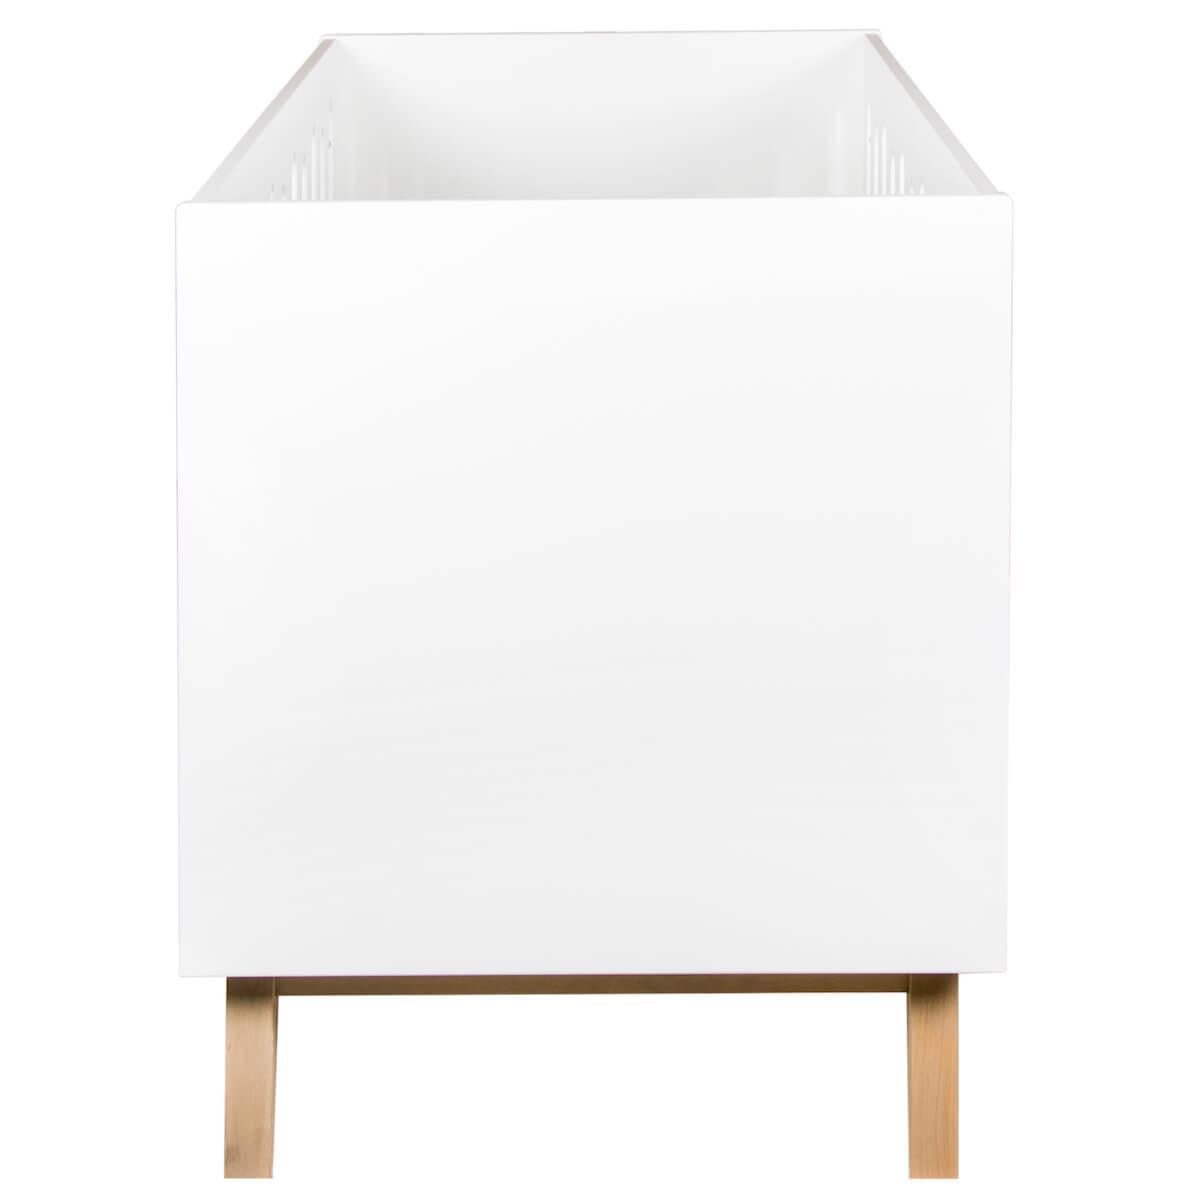 Lit évolutif 70x140cm TRENDY Quax blanc